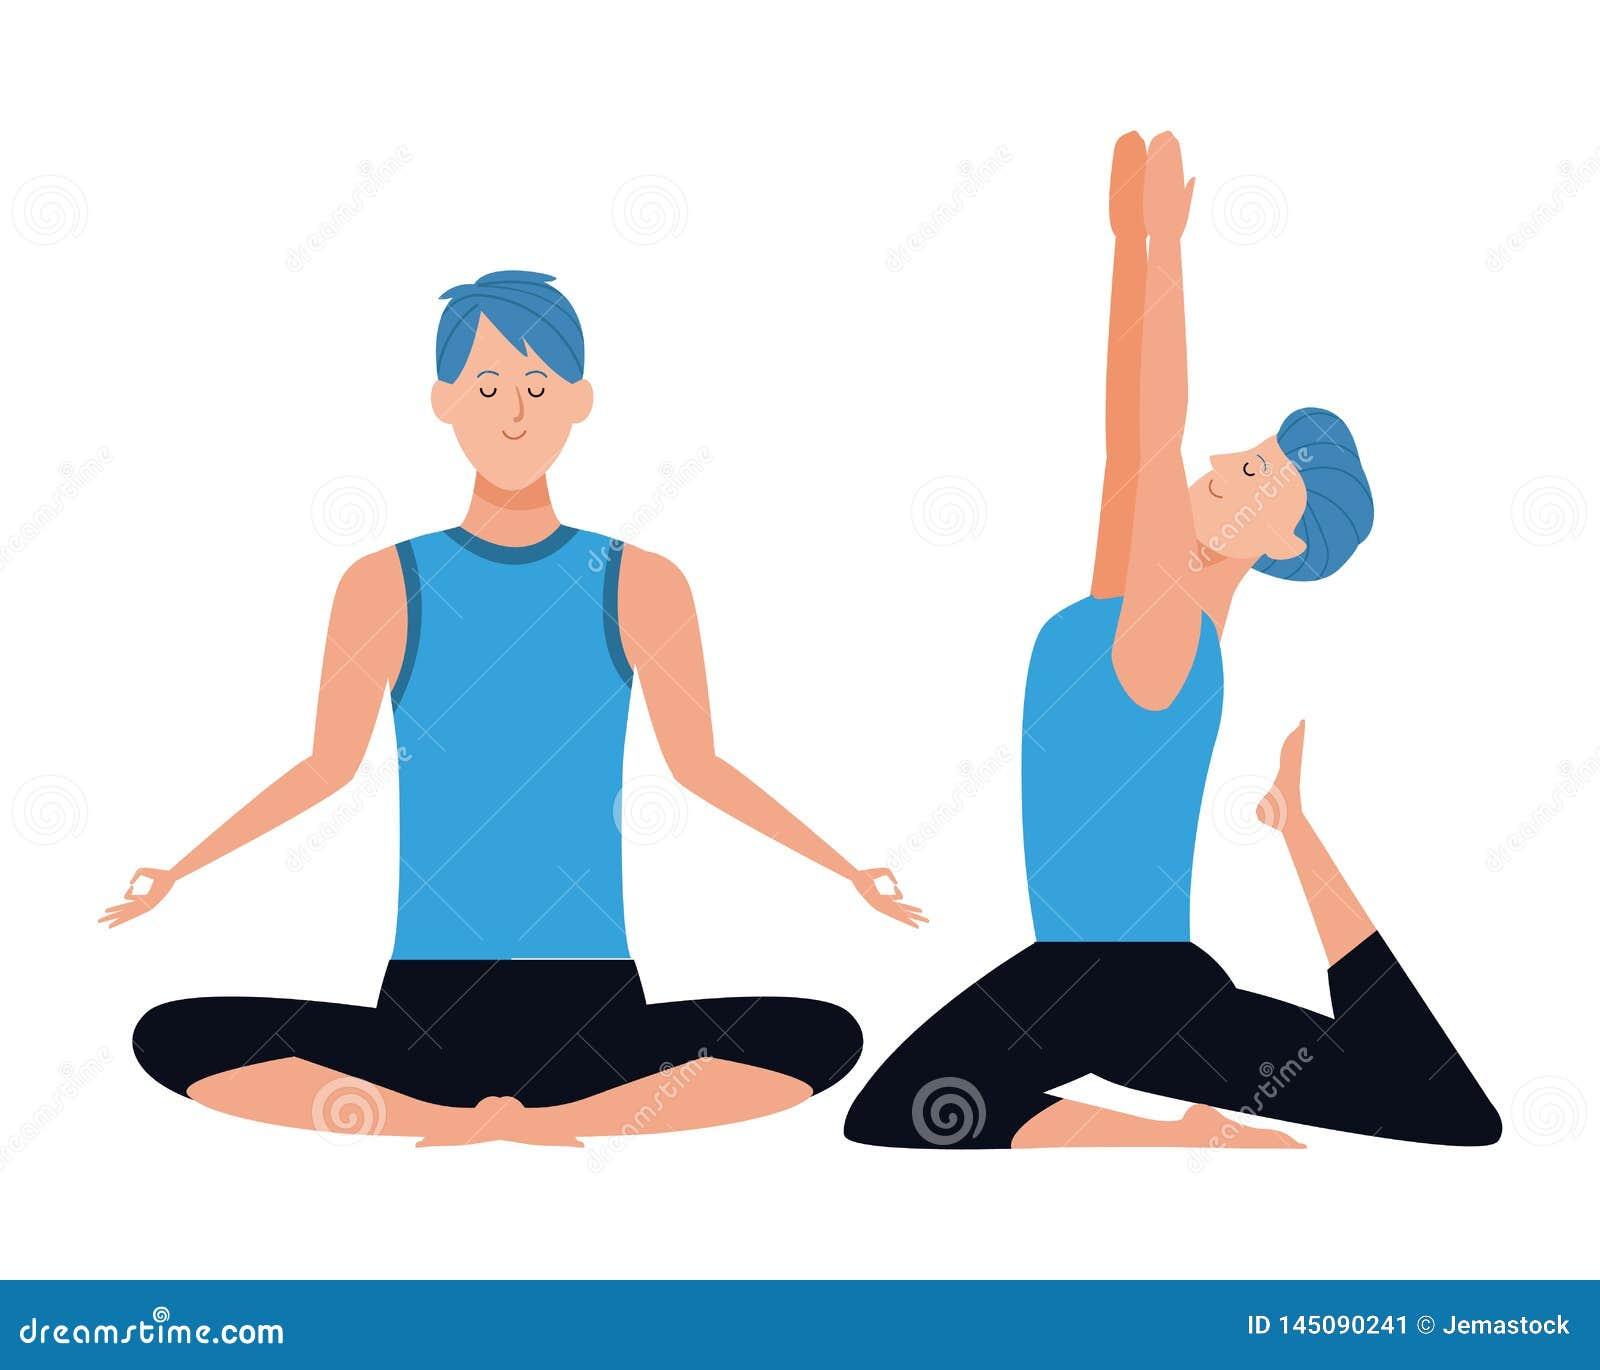 Men Yoga Poses Stock Vector Illustration Of Illustration 145090241